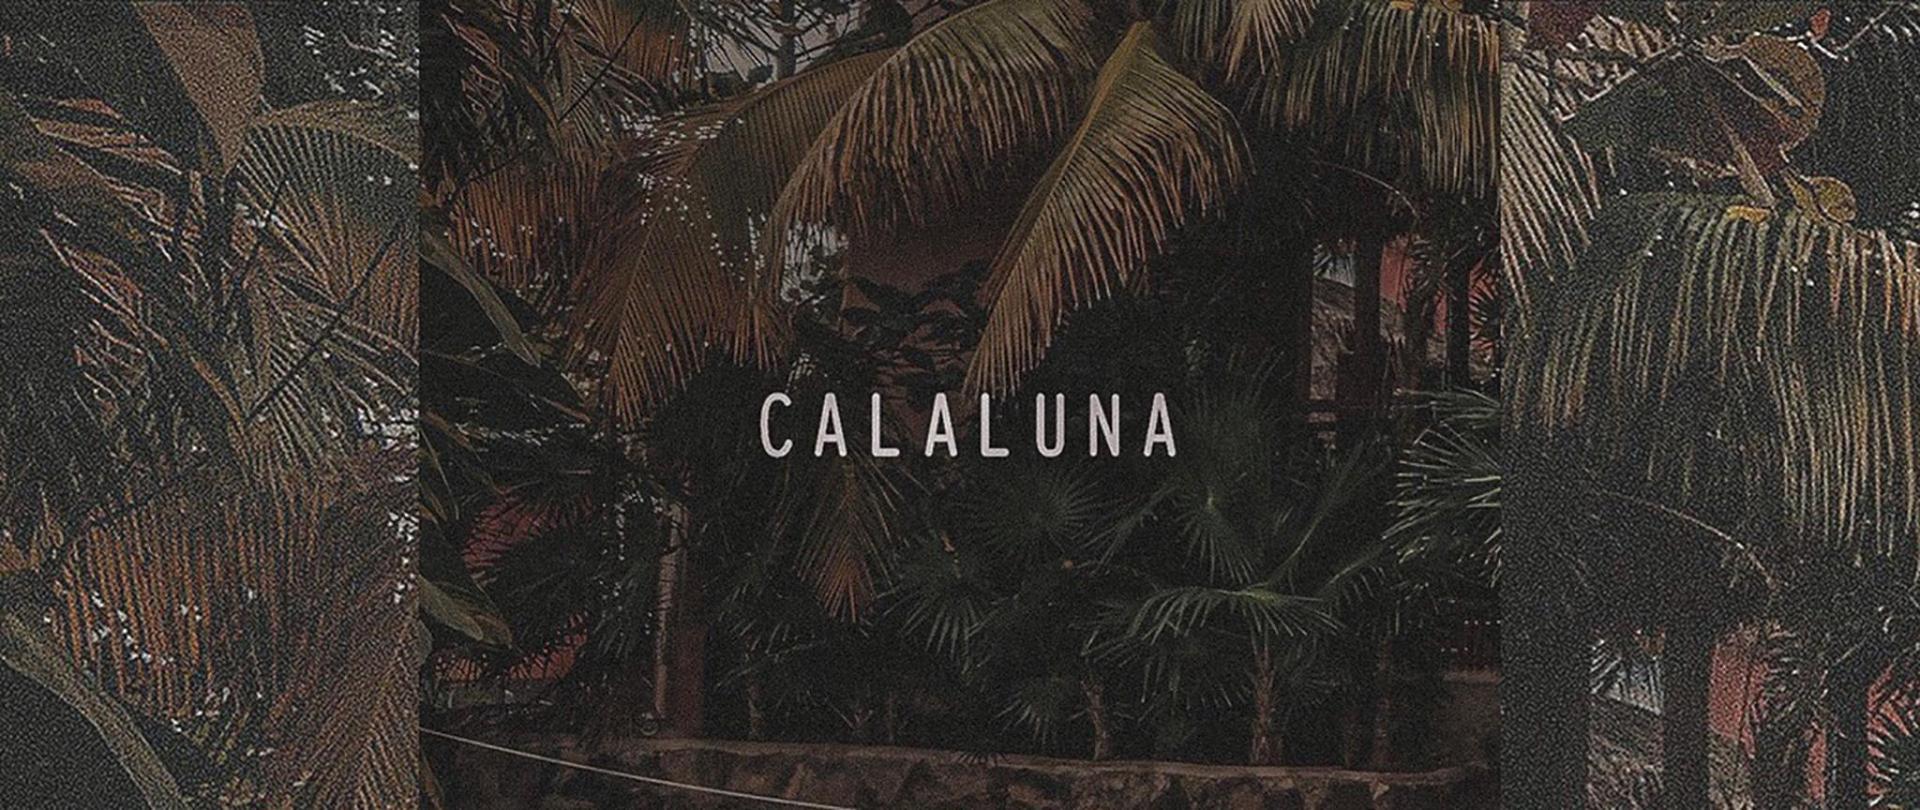 CALA new nome sfocata LRG.jpg